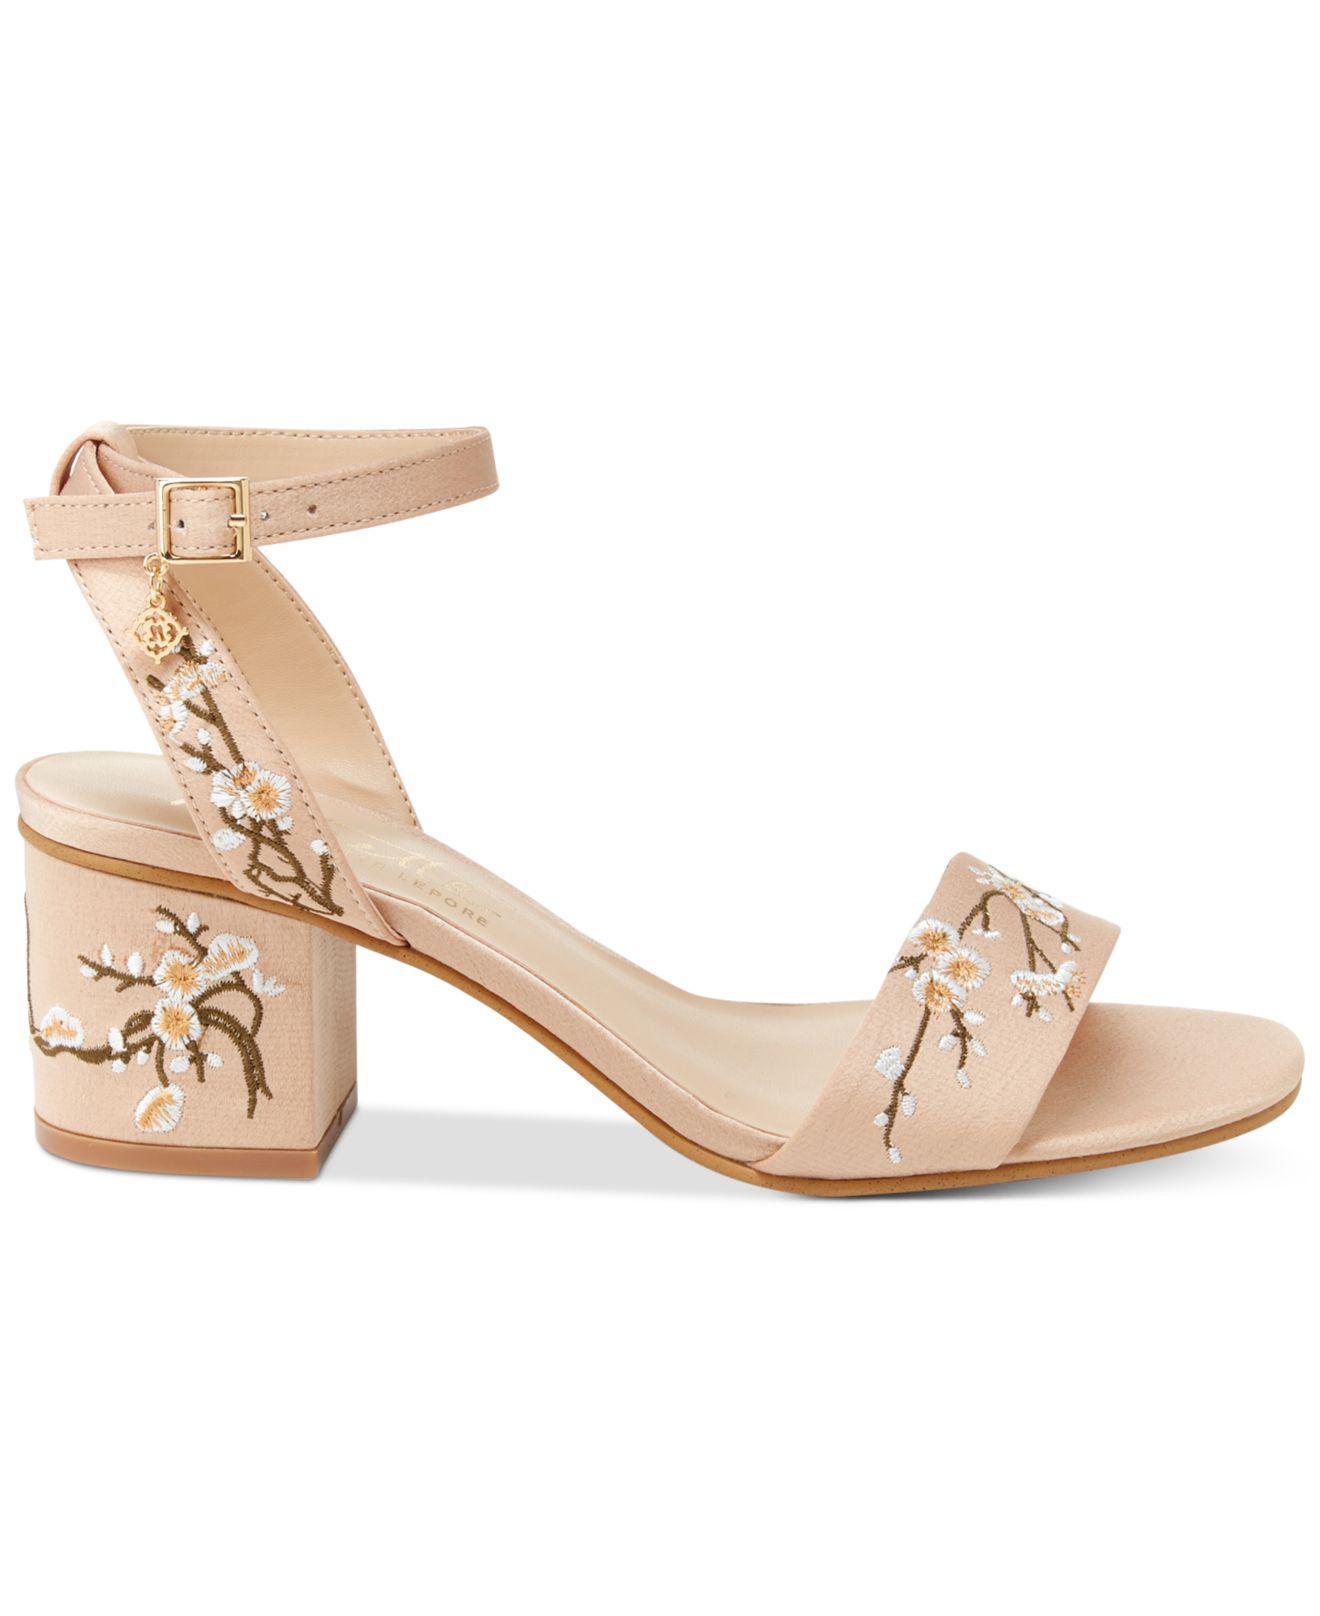 41959fba447 Lyst - Nanette Lepore Ruby Two-piece Block-heel Sandals